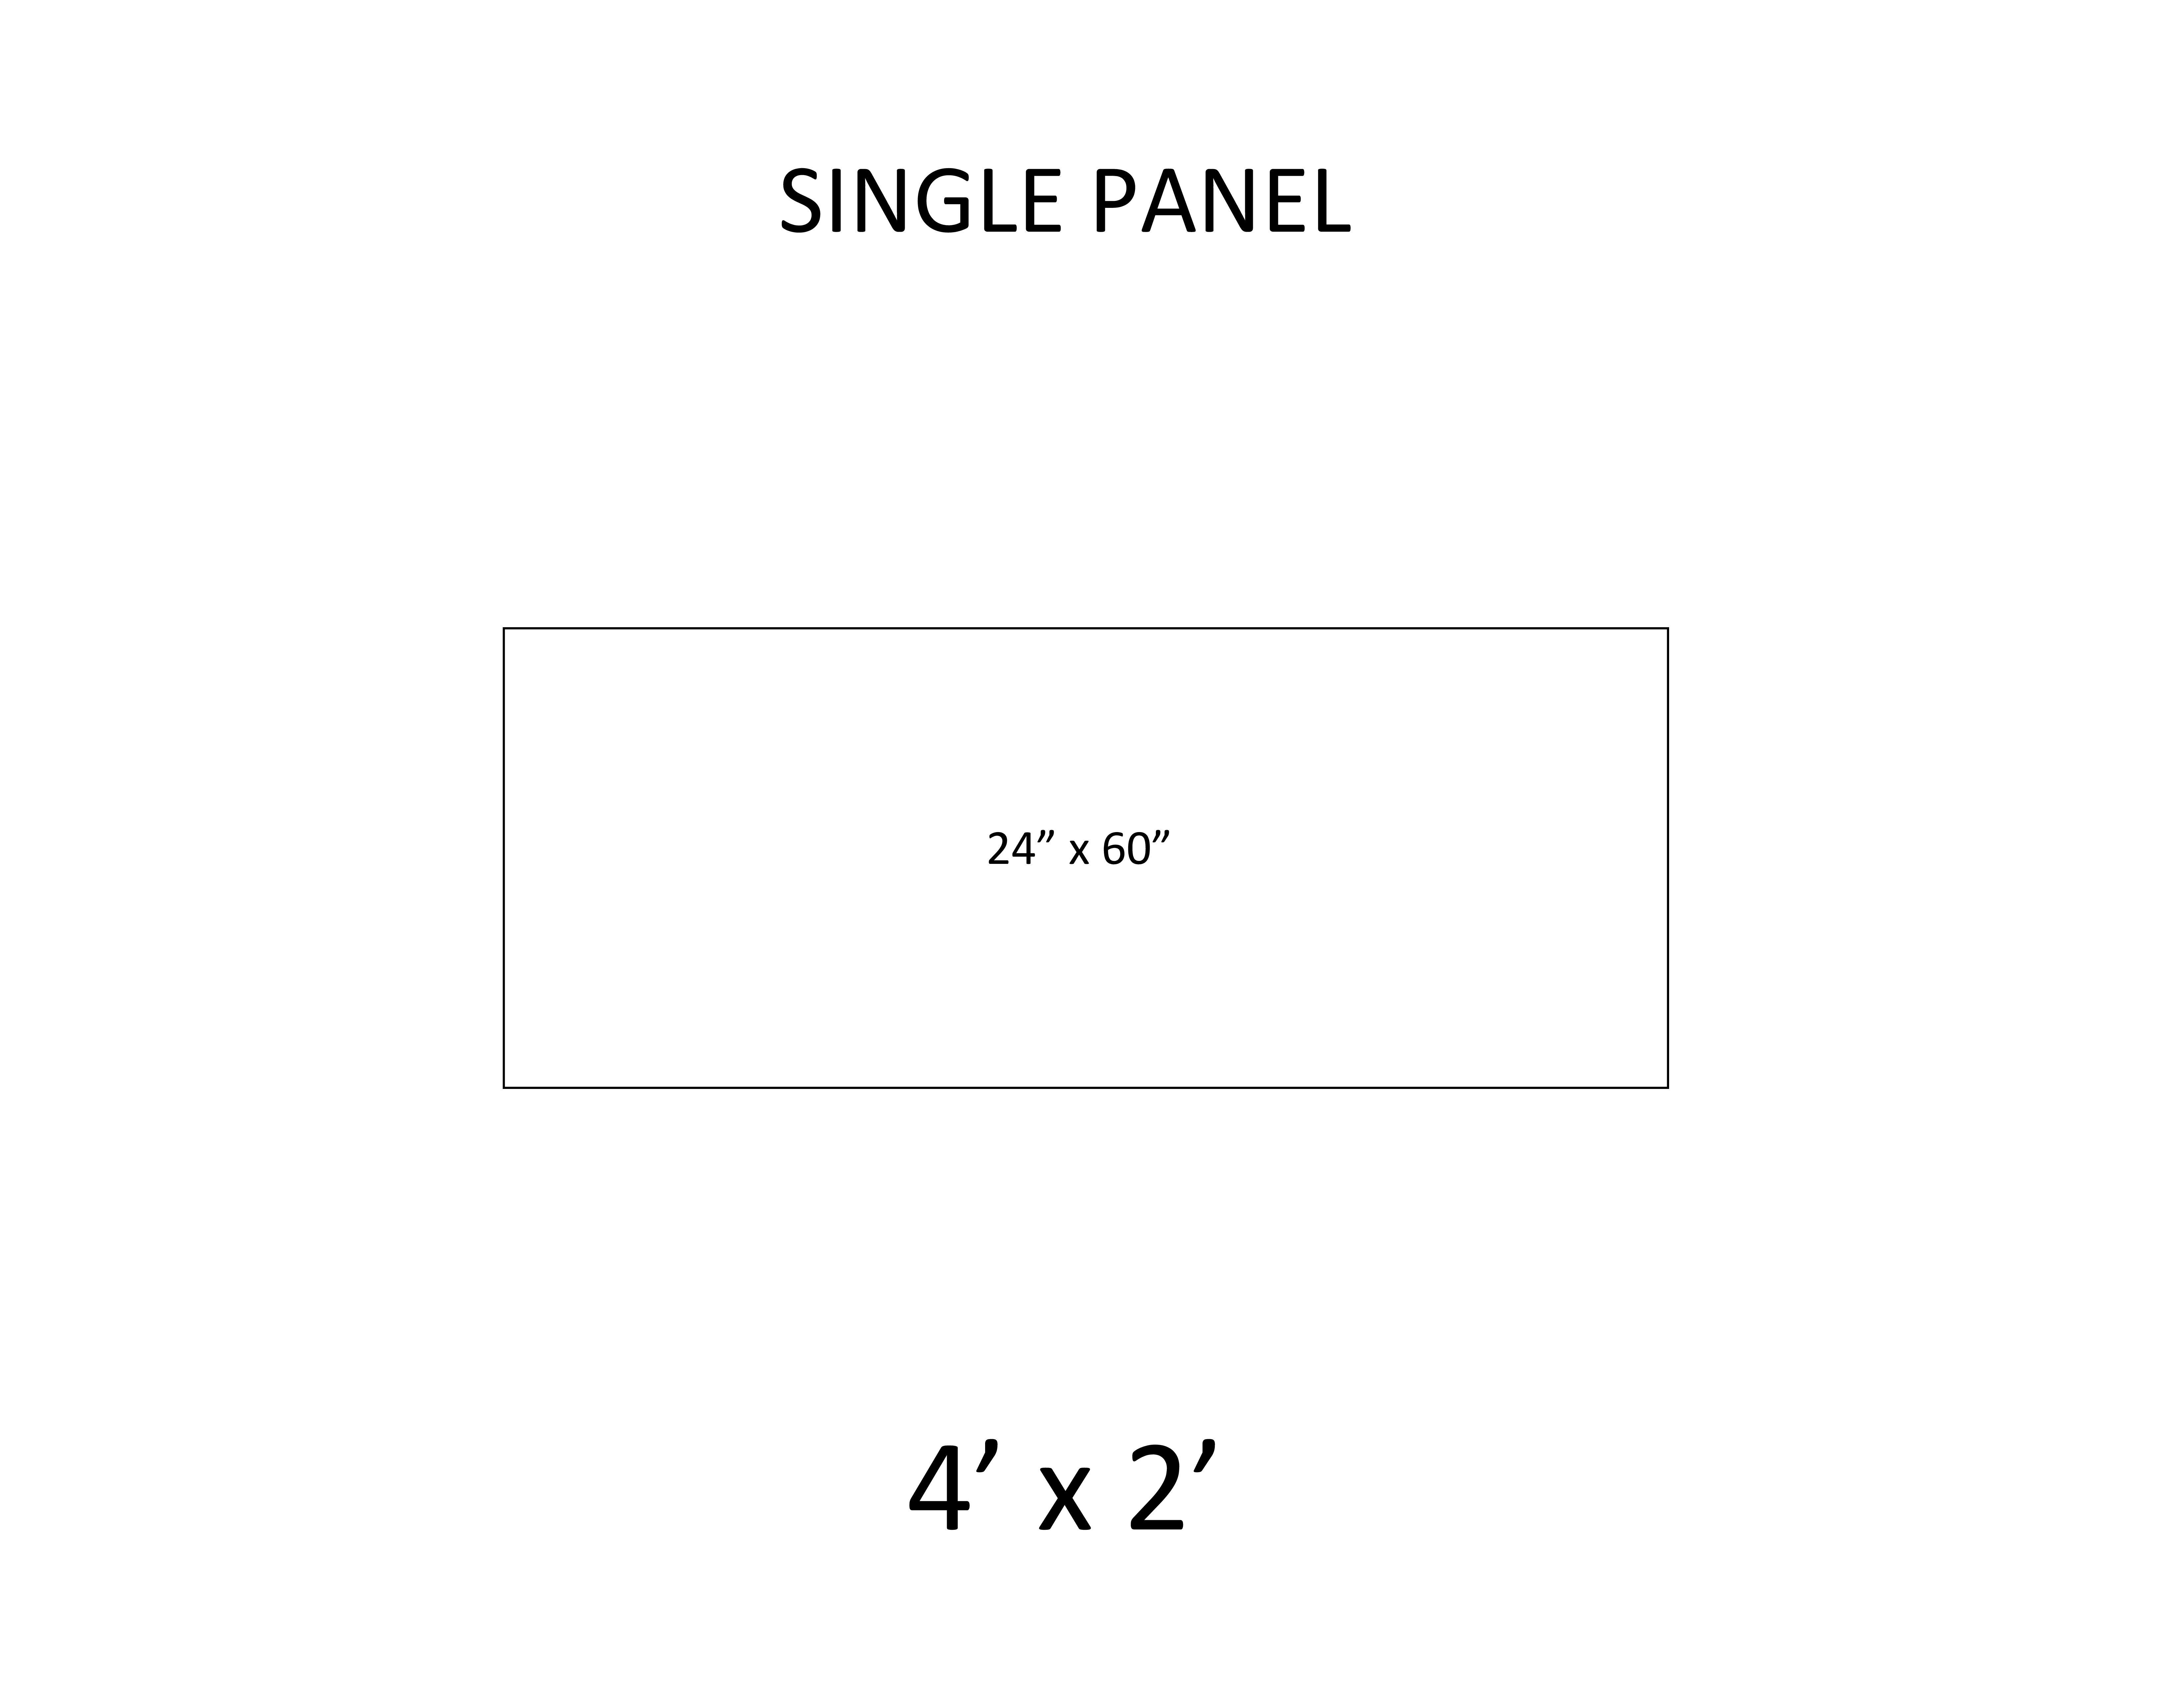 4 - Single Panel